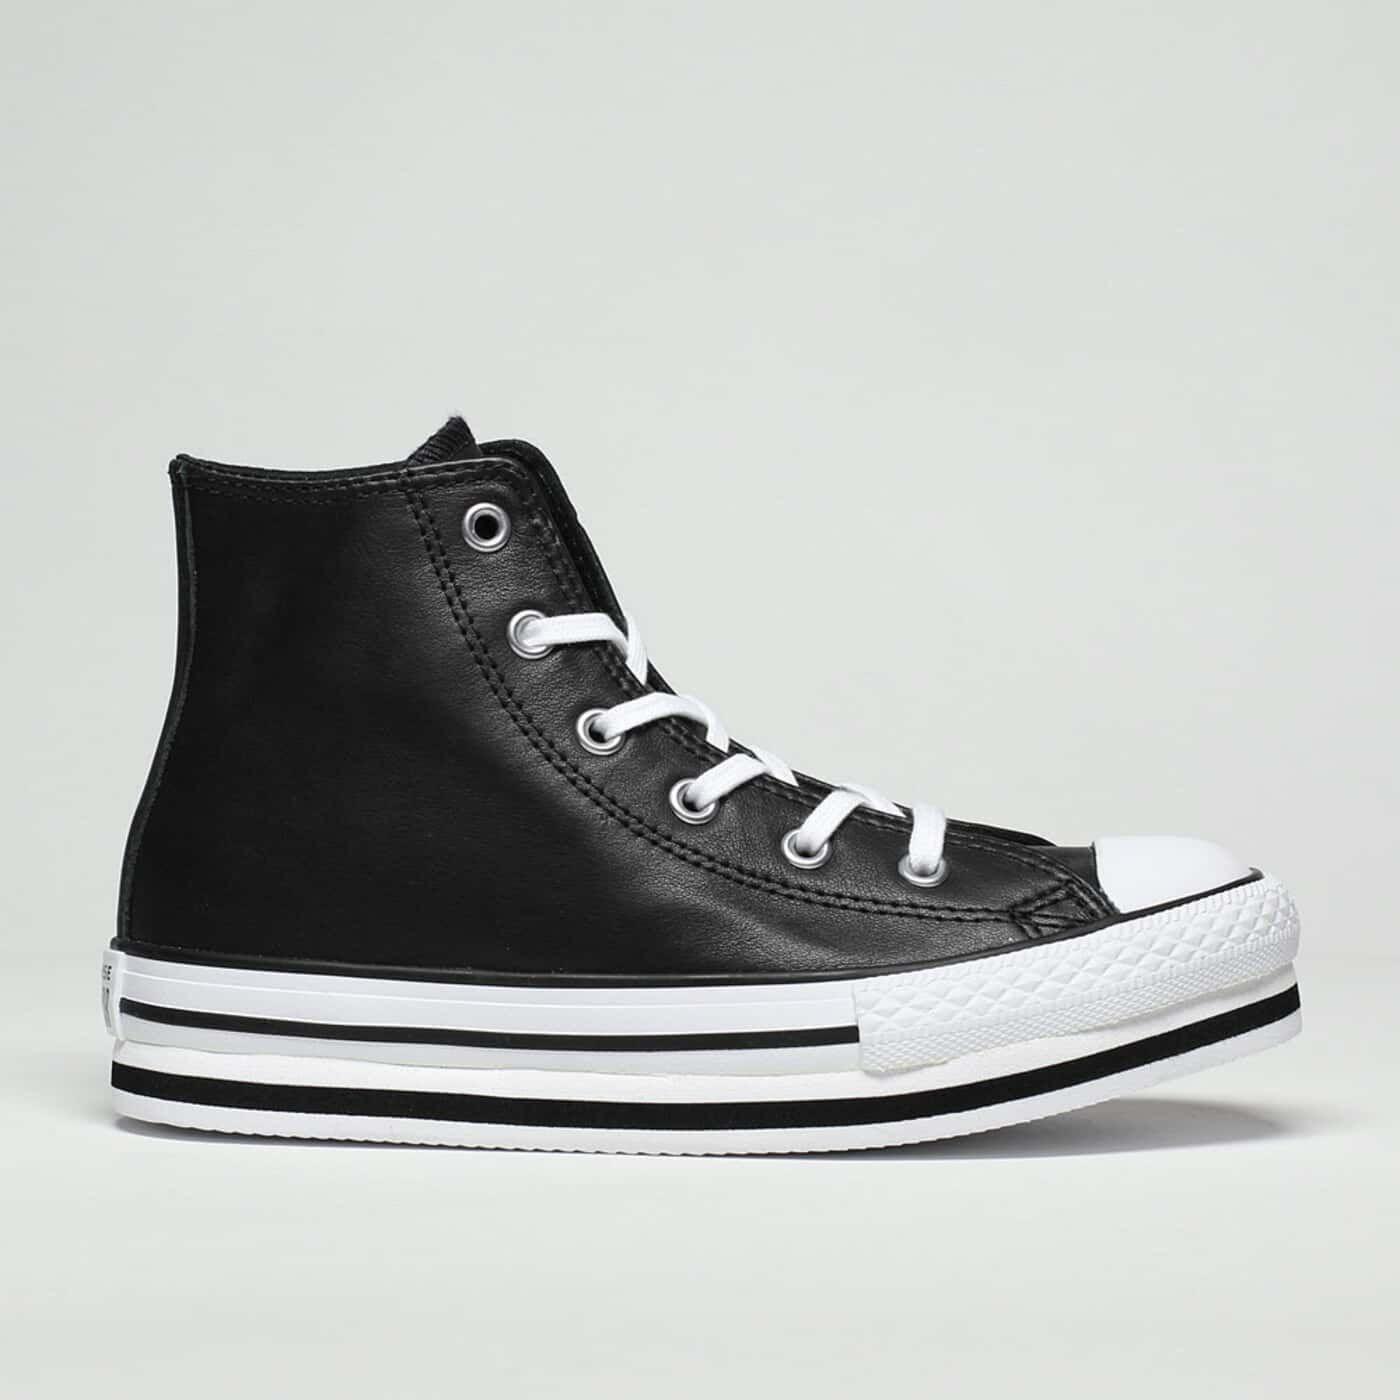 schuh | Girls black converse, Converse